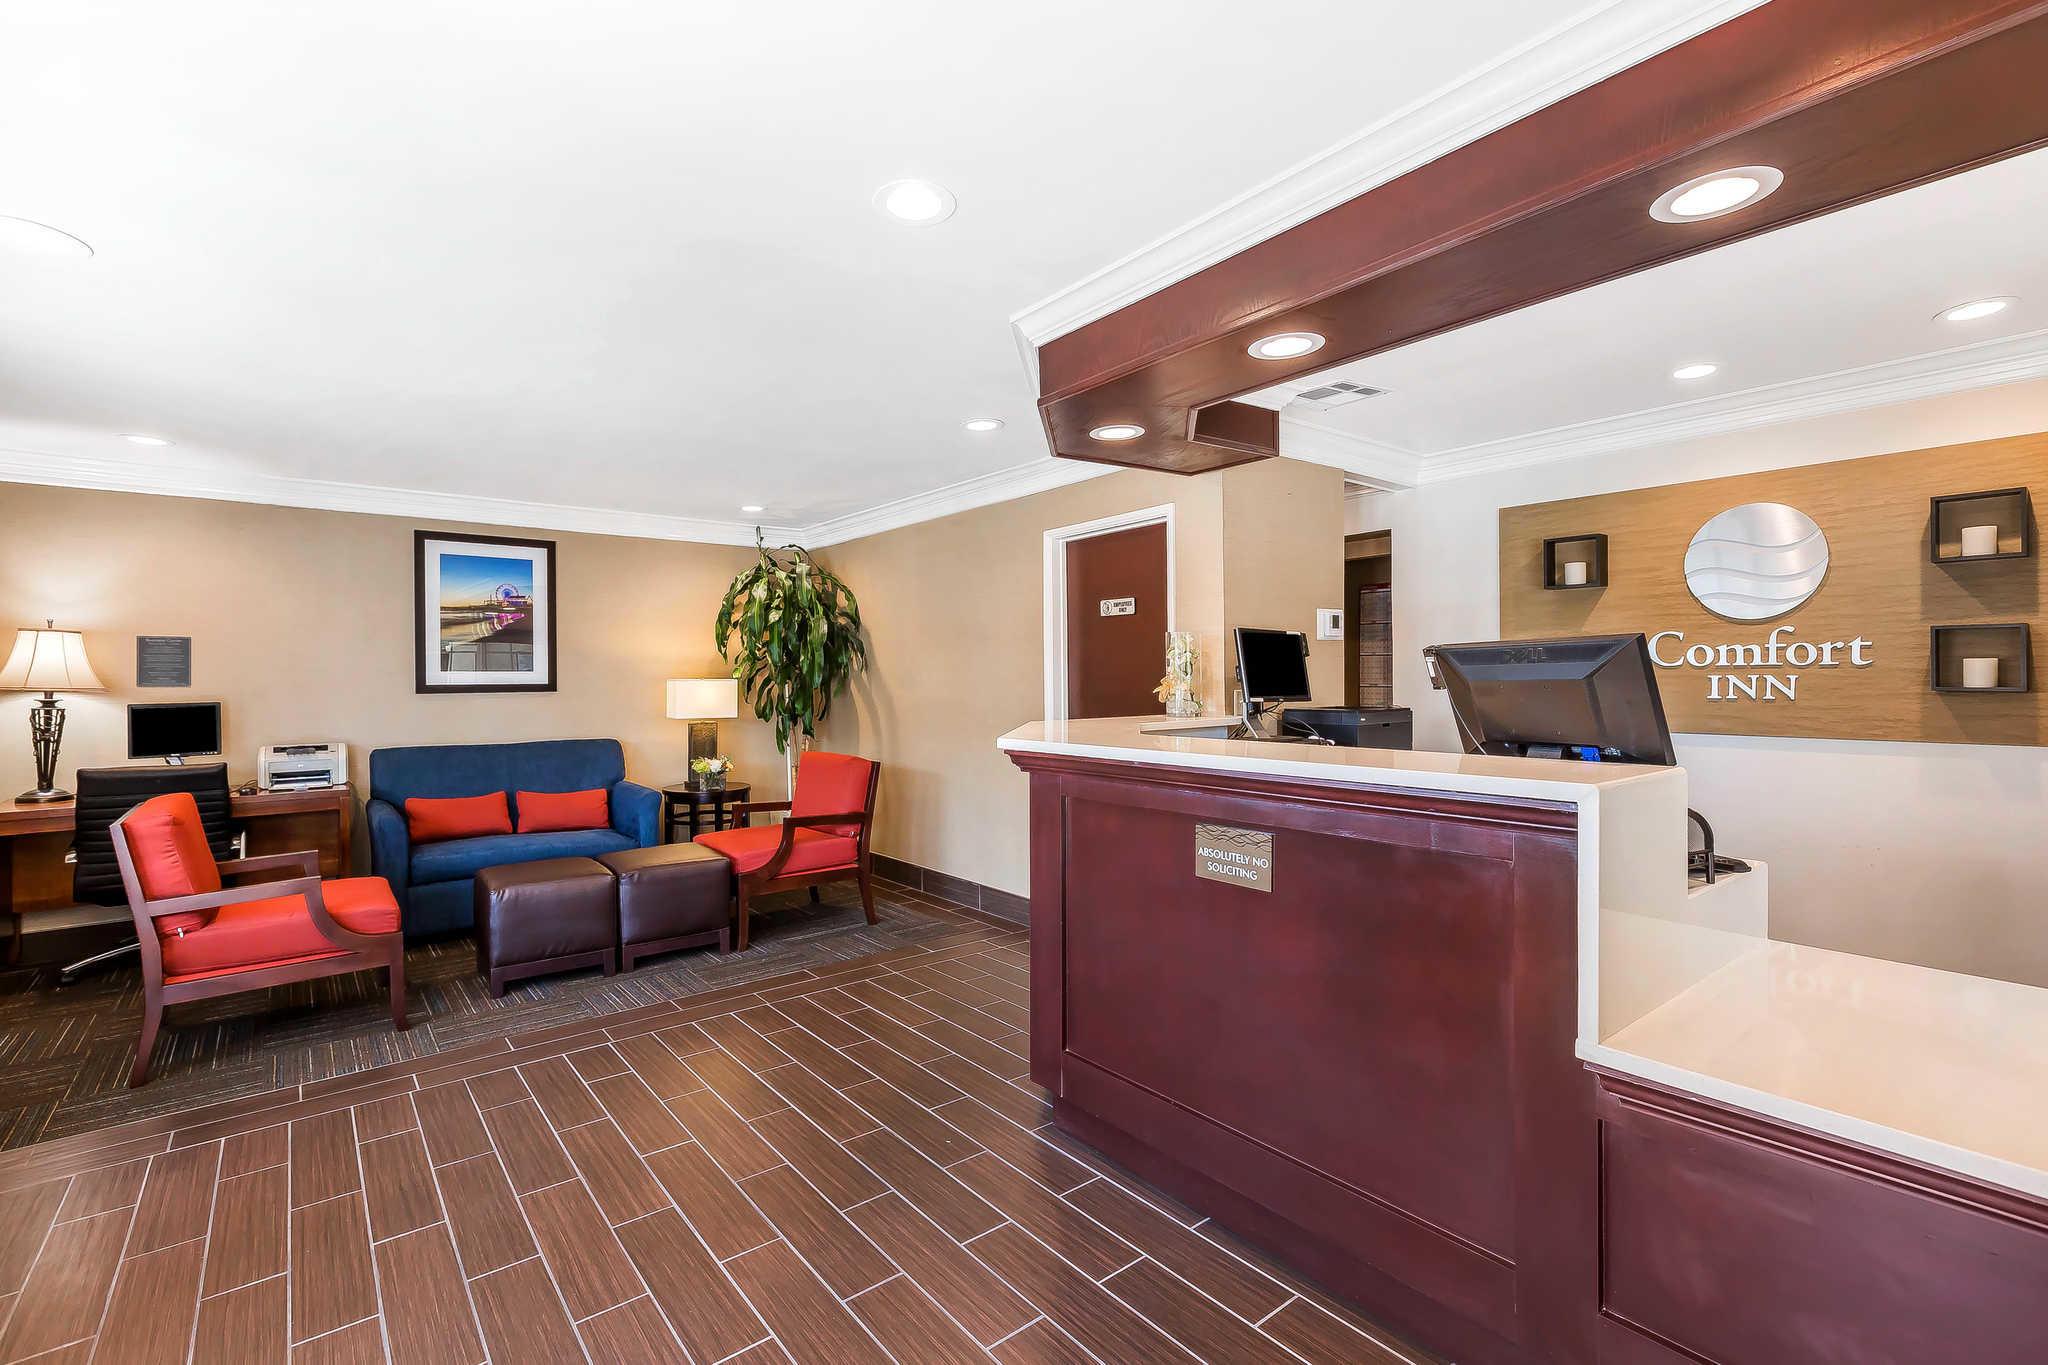 Comfort Inn Santa Monica - West Los Angeles image 6